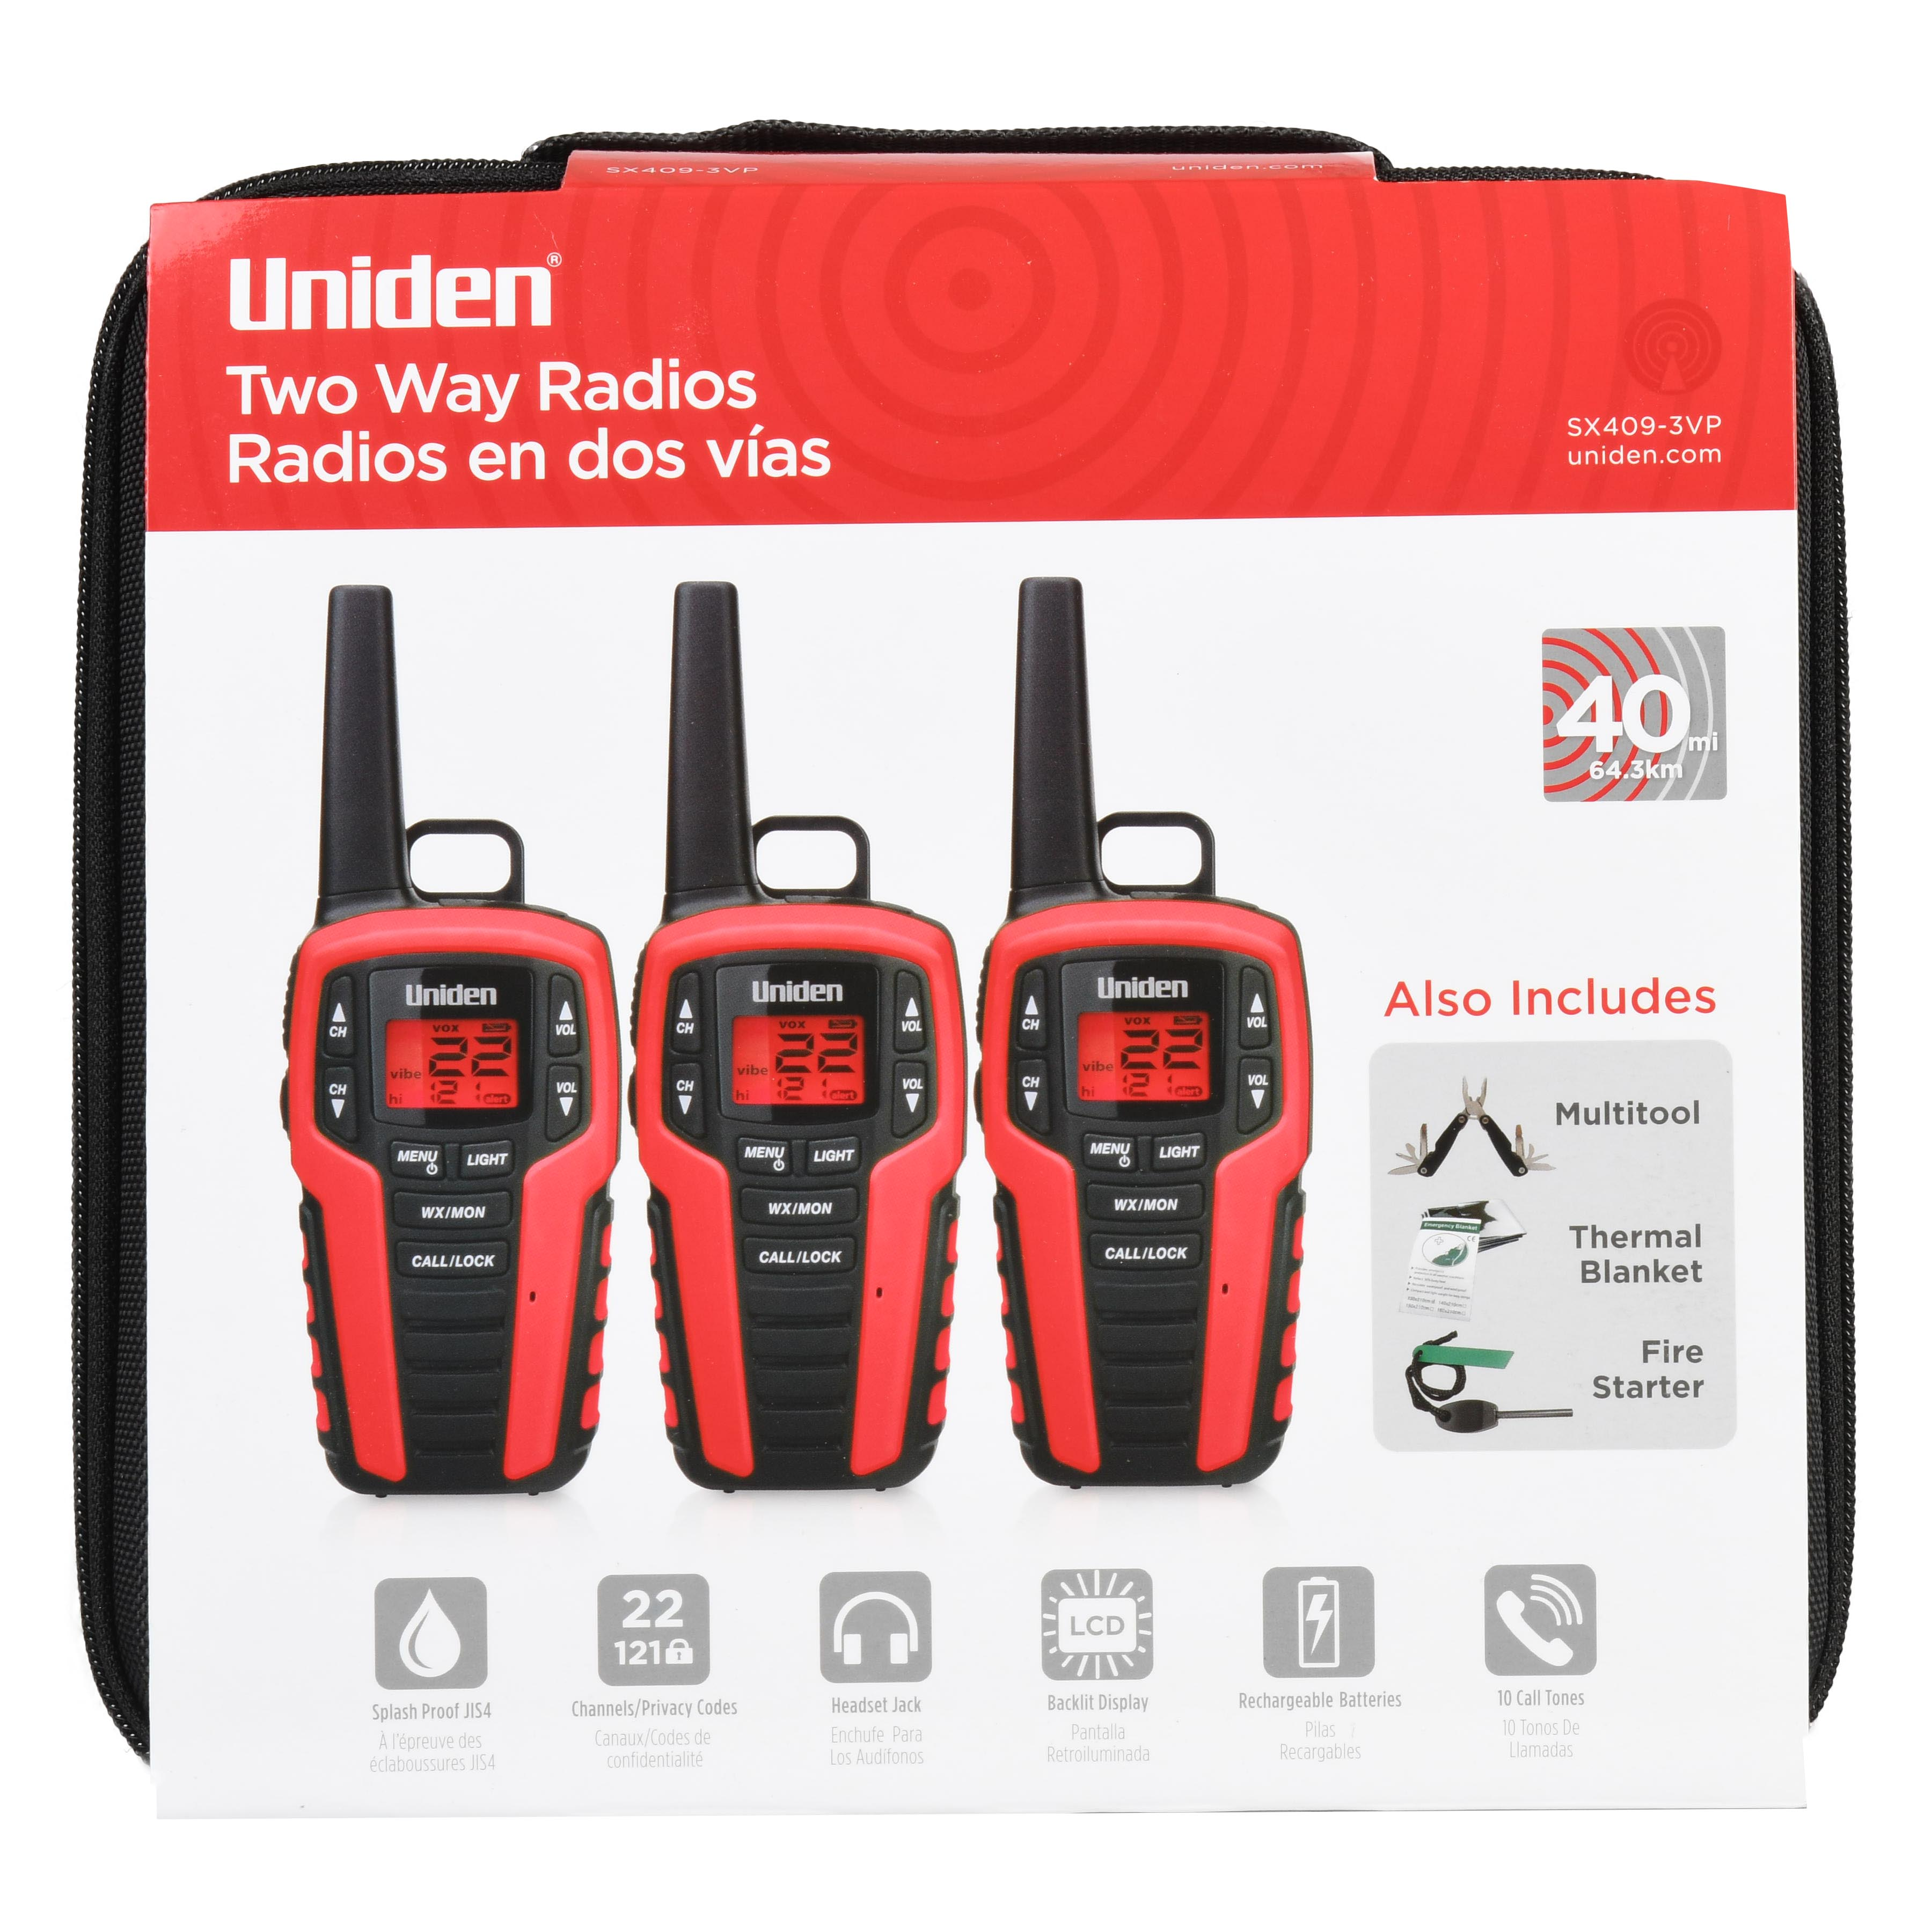 Uniden 40 Mile 22 Channel Two Way Radios Black Red 3 Pack Sx409 3vp Walmart Com Walmart Com